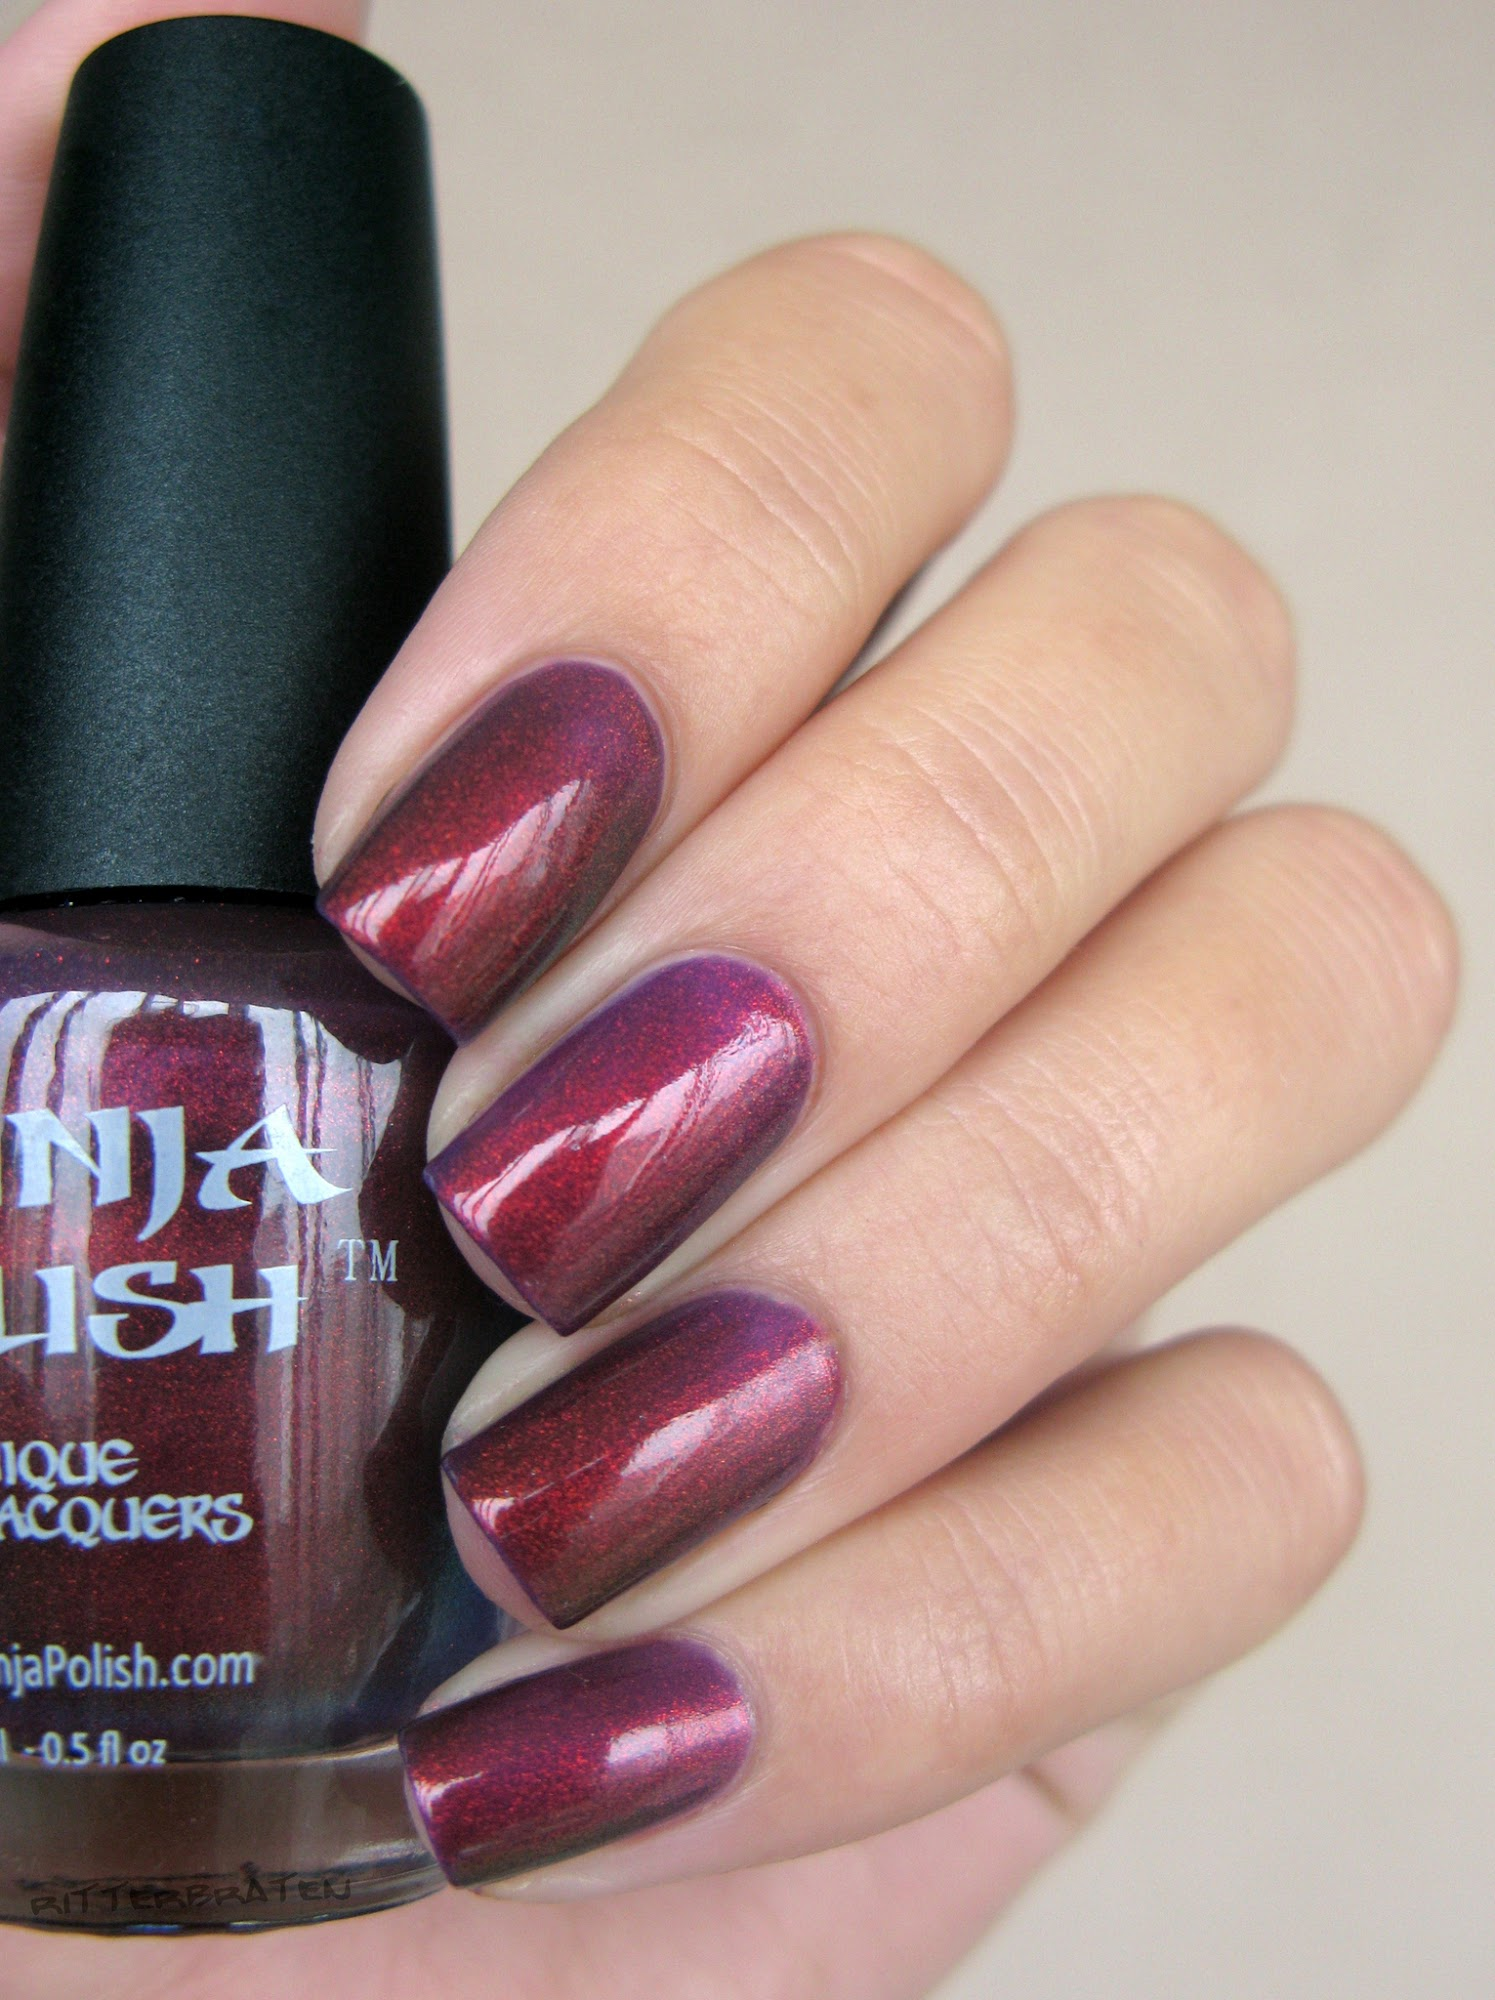 Ninja polish Divinity